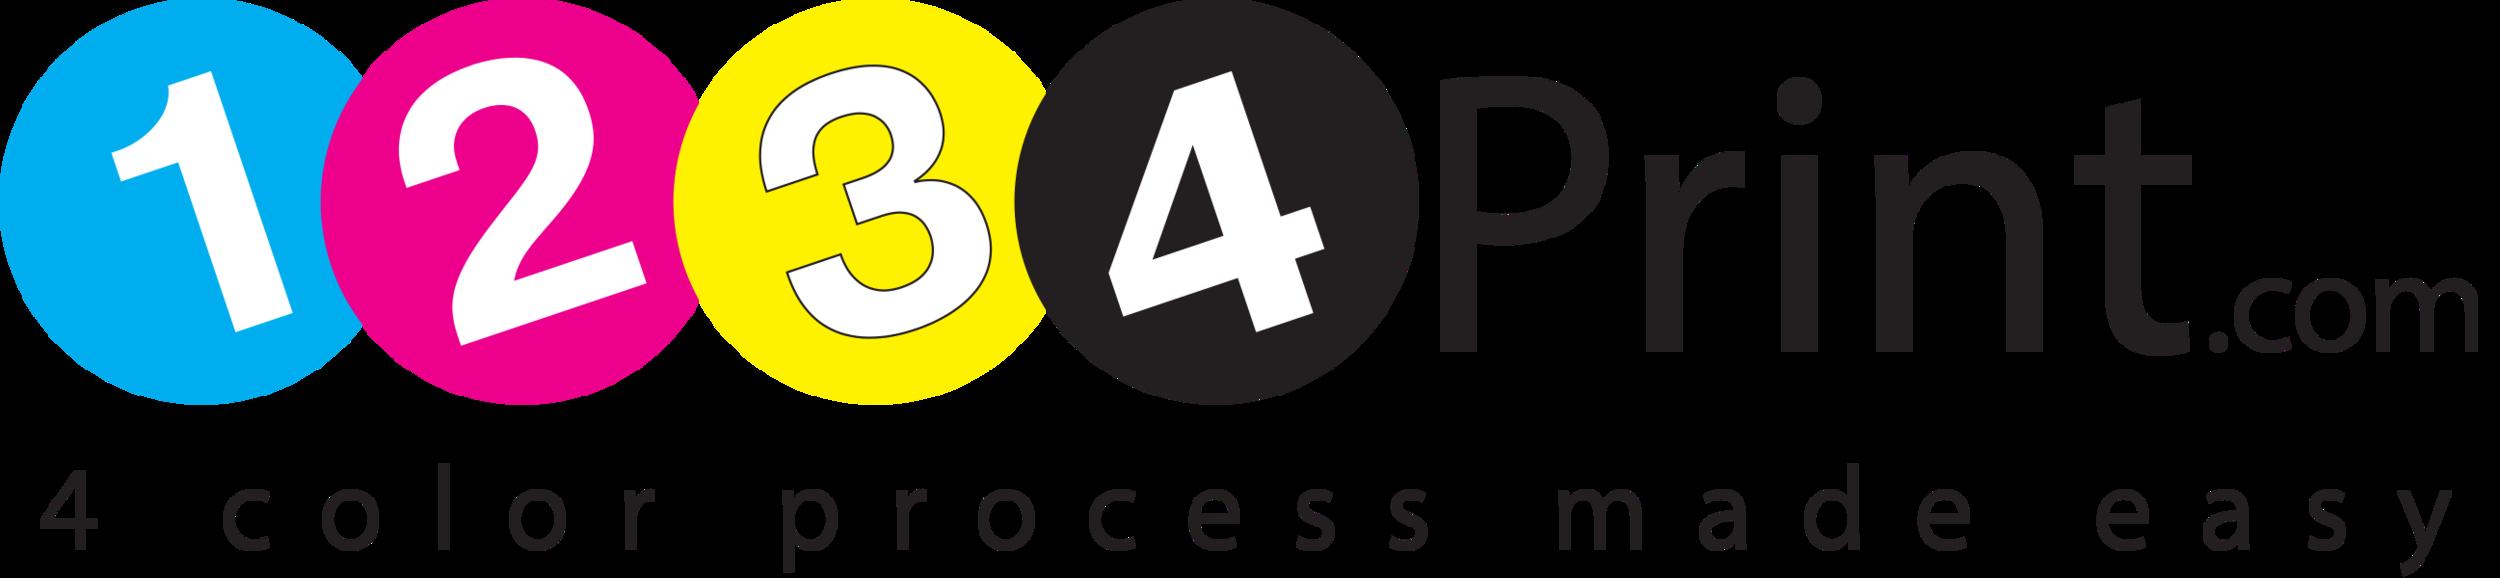 17_BBB_1234Print-Logo_PNG.png